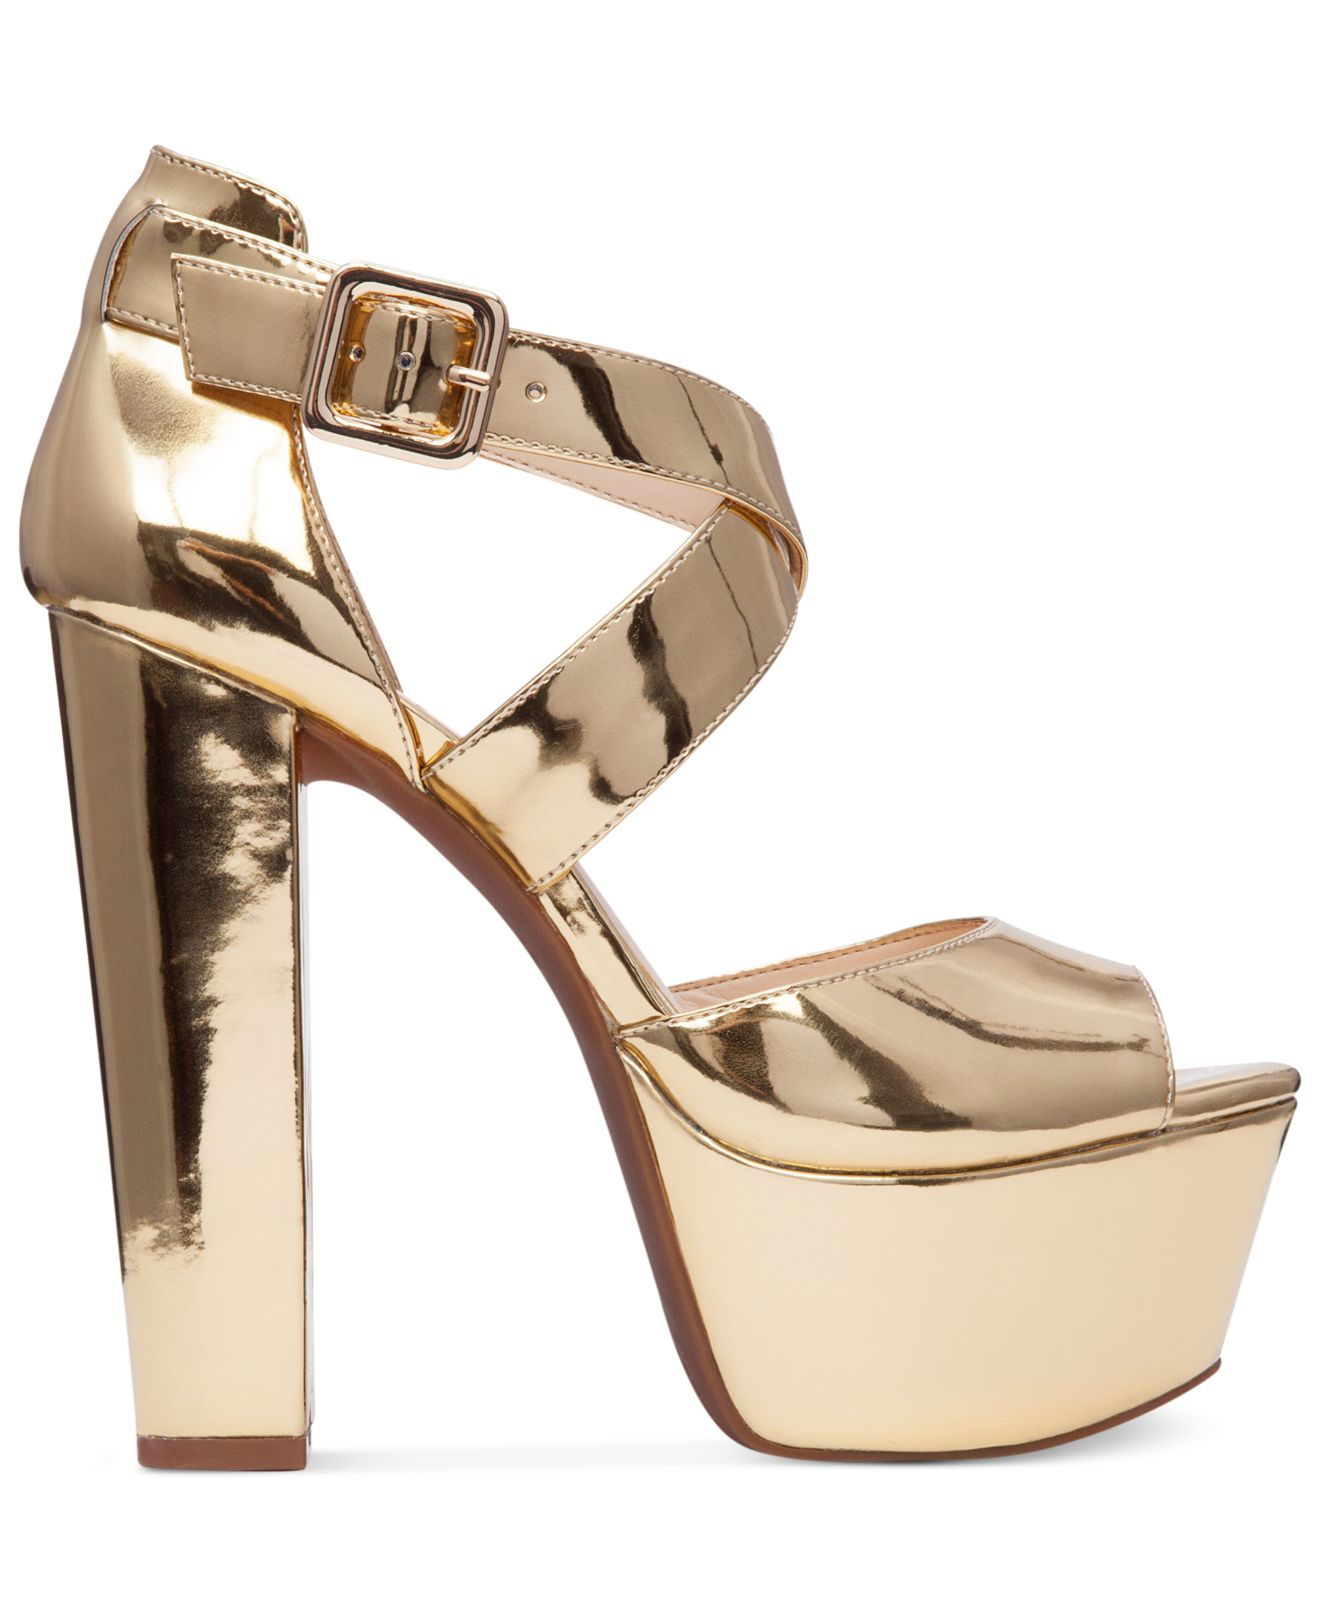 3bb9c9d8b7b Lyst - Jessica Simpson Derian Platform Sandals in Metallic